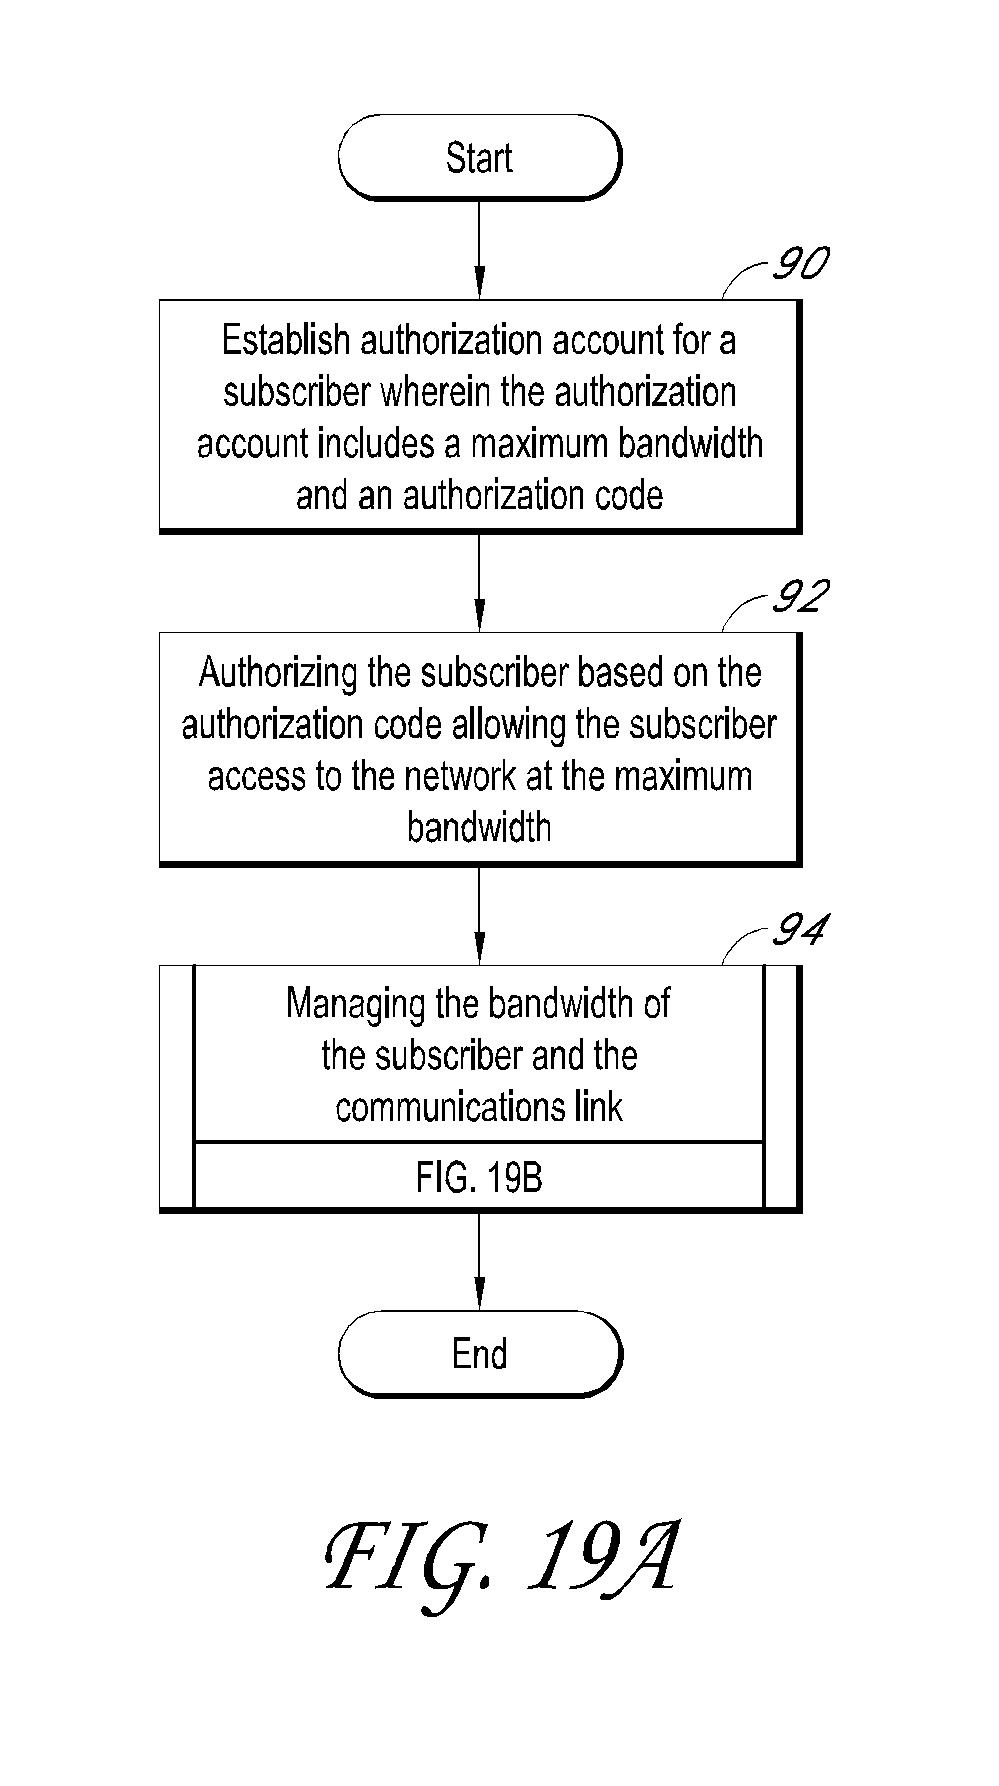 Patent US 8,370,477 B2